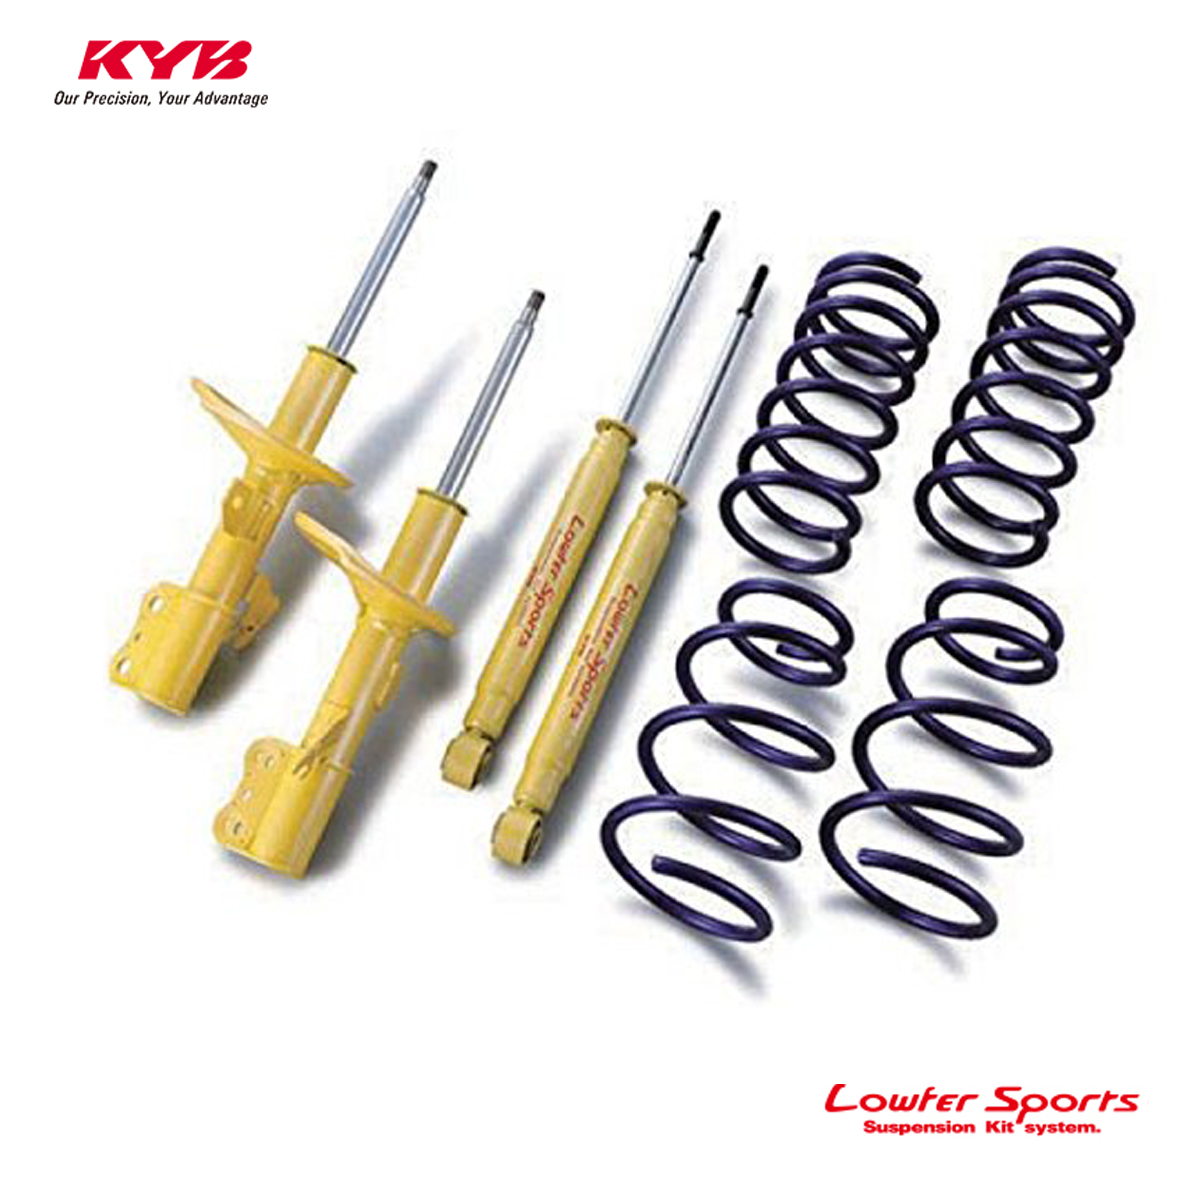 KYB カヤバ マーチ K13 ショックアブソーバー サスペンションキット Lowfer Sports LKIT-K13 配送先条件有り